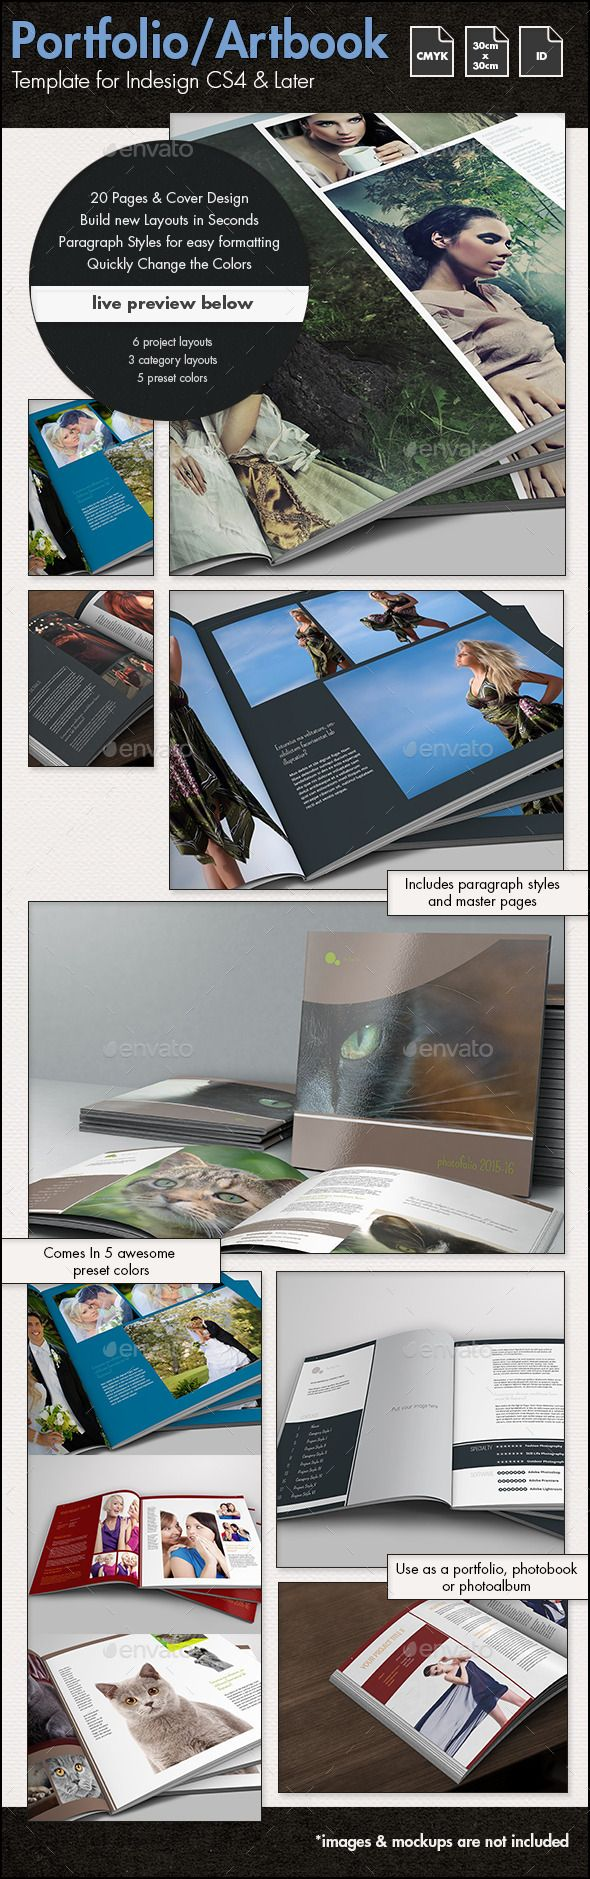 Photobook / Portfolio / Artbook Template - 30x30cm